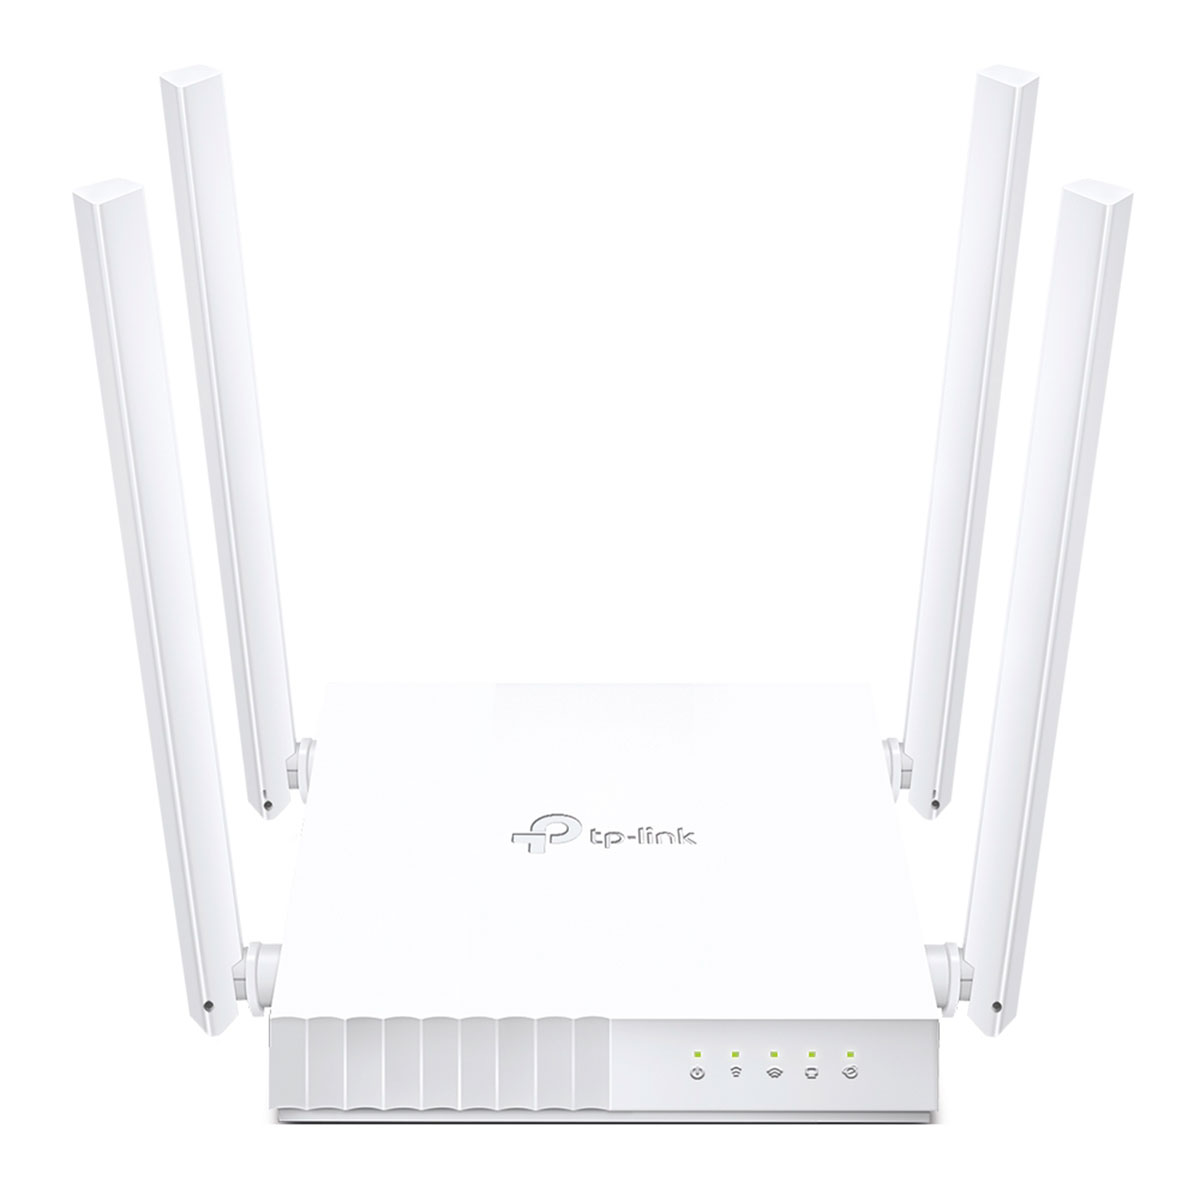 Roteador TP-Link Archer C21 AC750, Wireless Wi-Fi 5, Dual Band, 4 Antenas